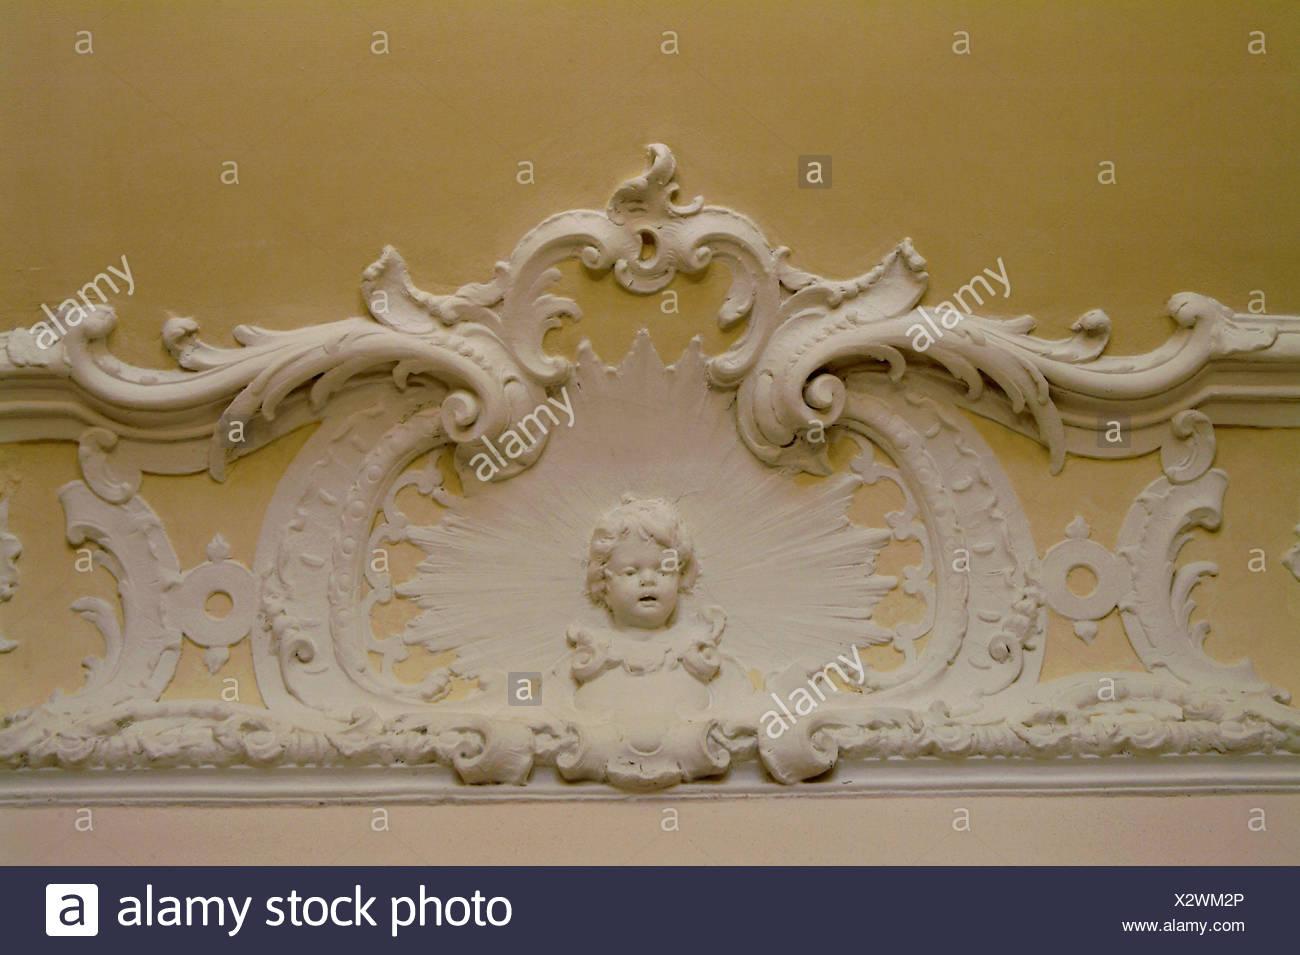 Wall, Stucco, Angels, Ornamentation, Interior, Decoration, Ornamentations,  Plaster, Stucco, Putto, Skillfully, Nobly, Art, Plastic, Interior Decoration,  ...